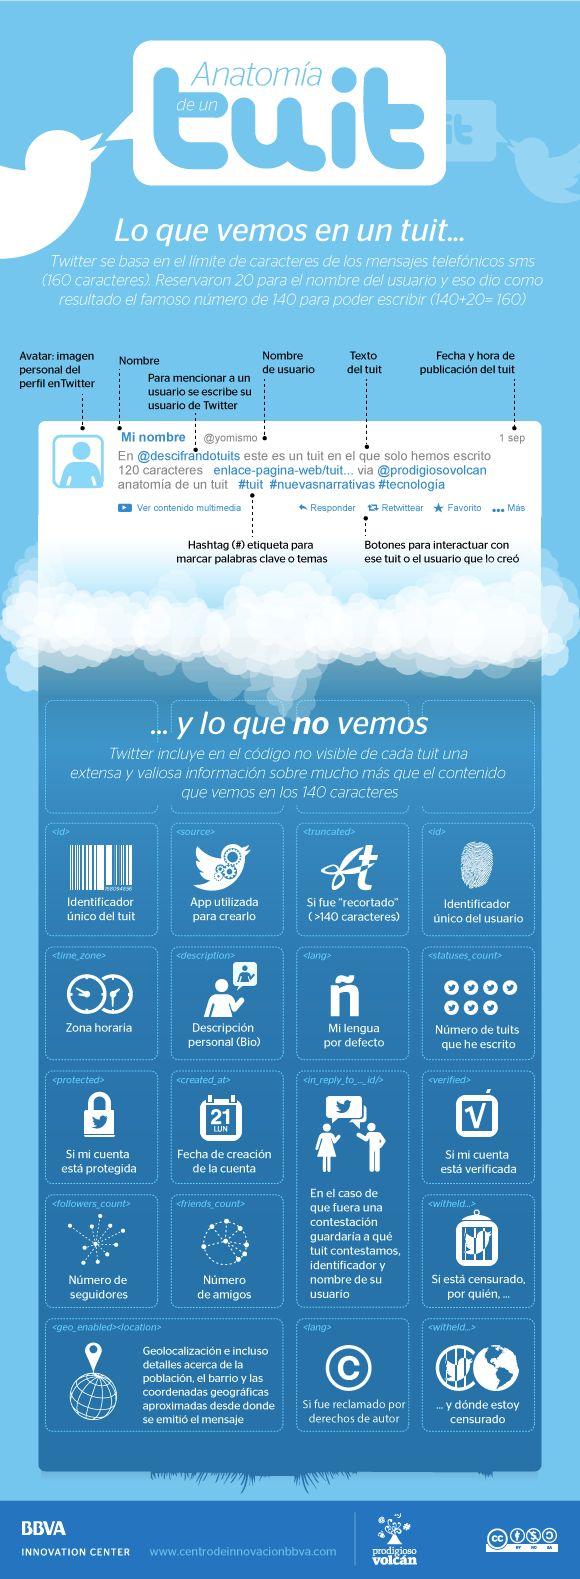 Anatomia-de-un-tuit